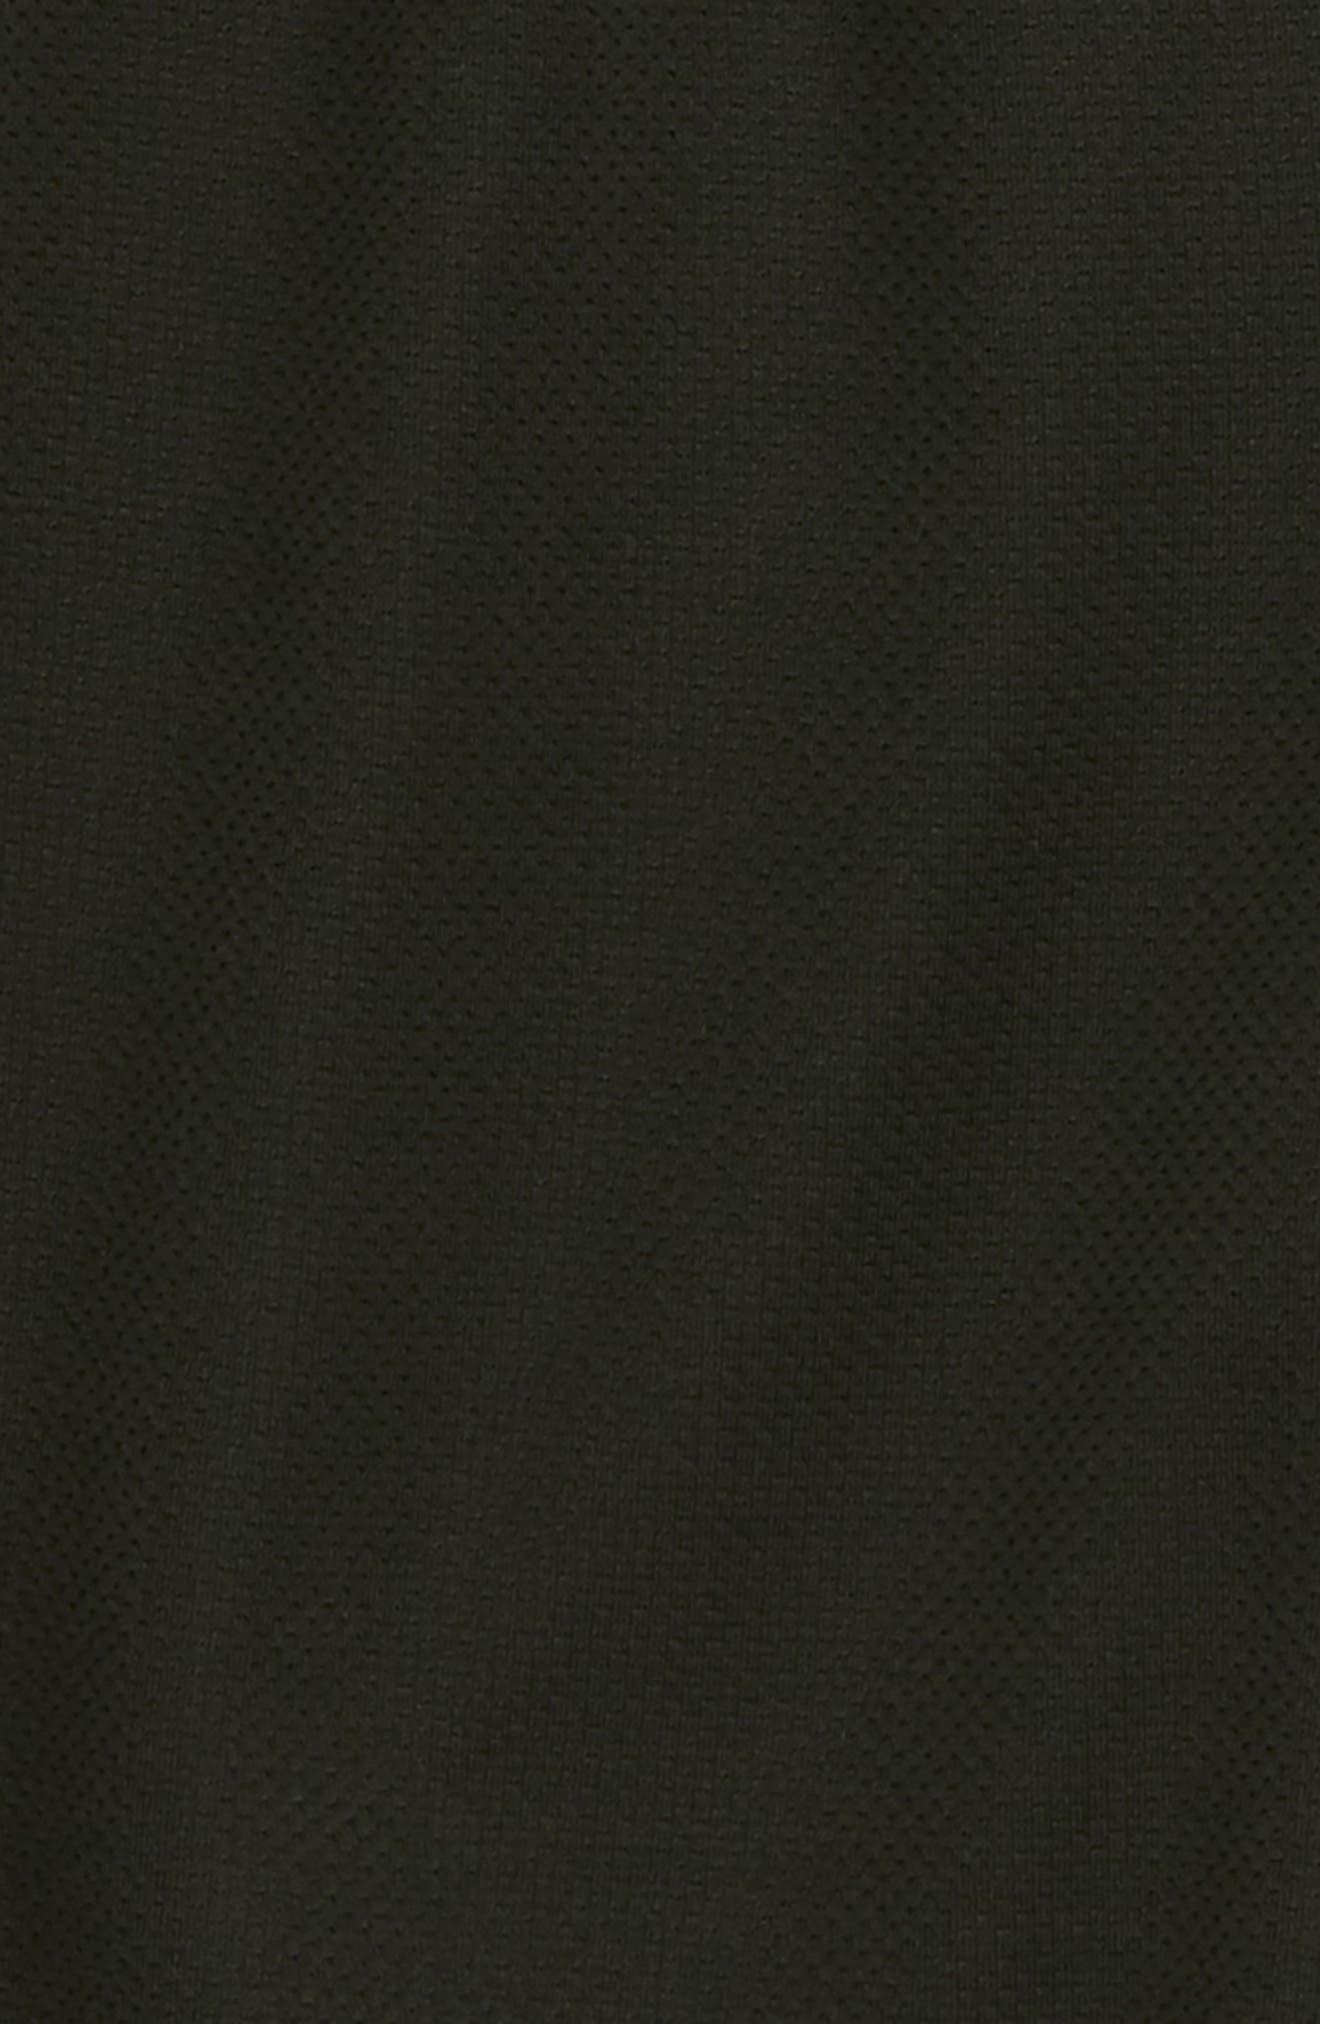 Tech Prototype HeatGear<sup>®</sup> Shorts,                             Alternate thumbnail 2, color,                             ARTILLERY GREEN/ BLACK